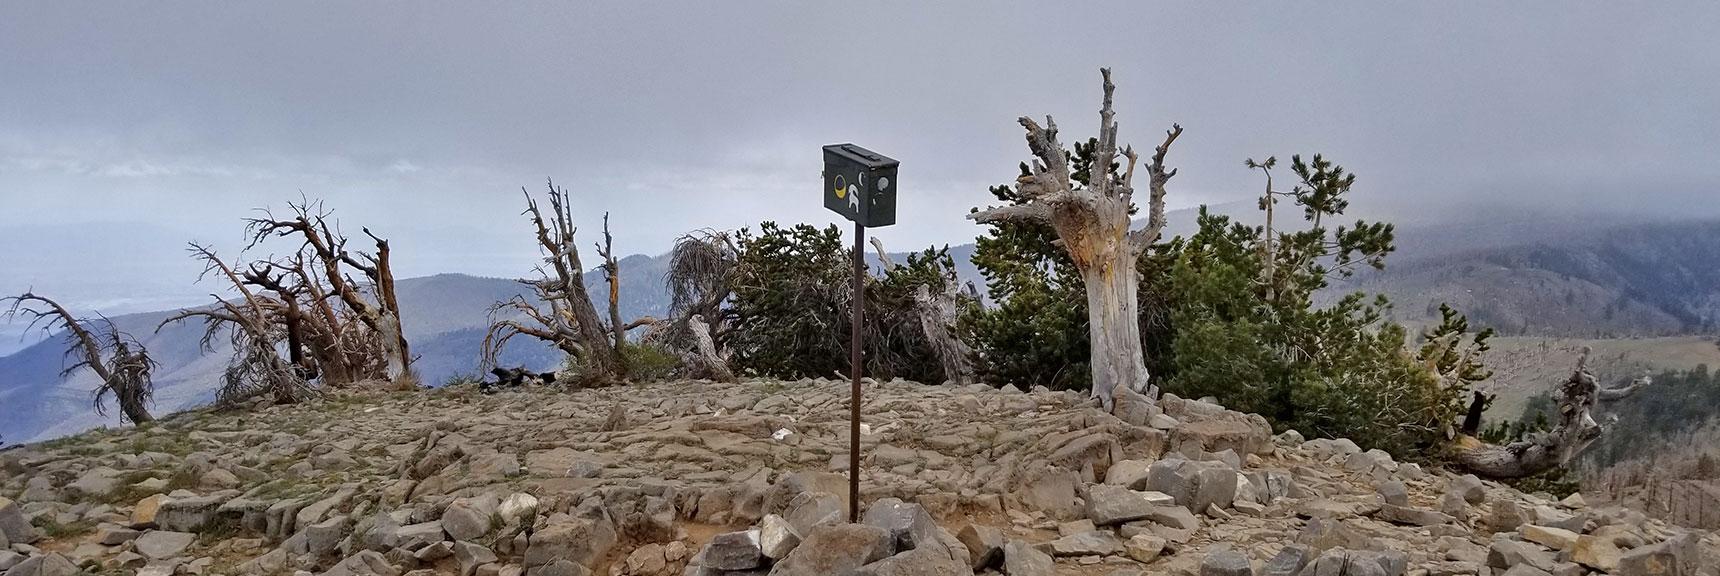 Arrival at Griffith Peak Summit | Harris Mountain Griffith Peak Circuit in Mt. Charleston Wilderness, Nevada